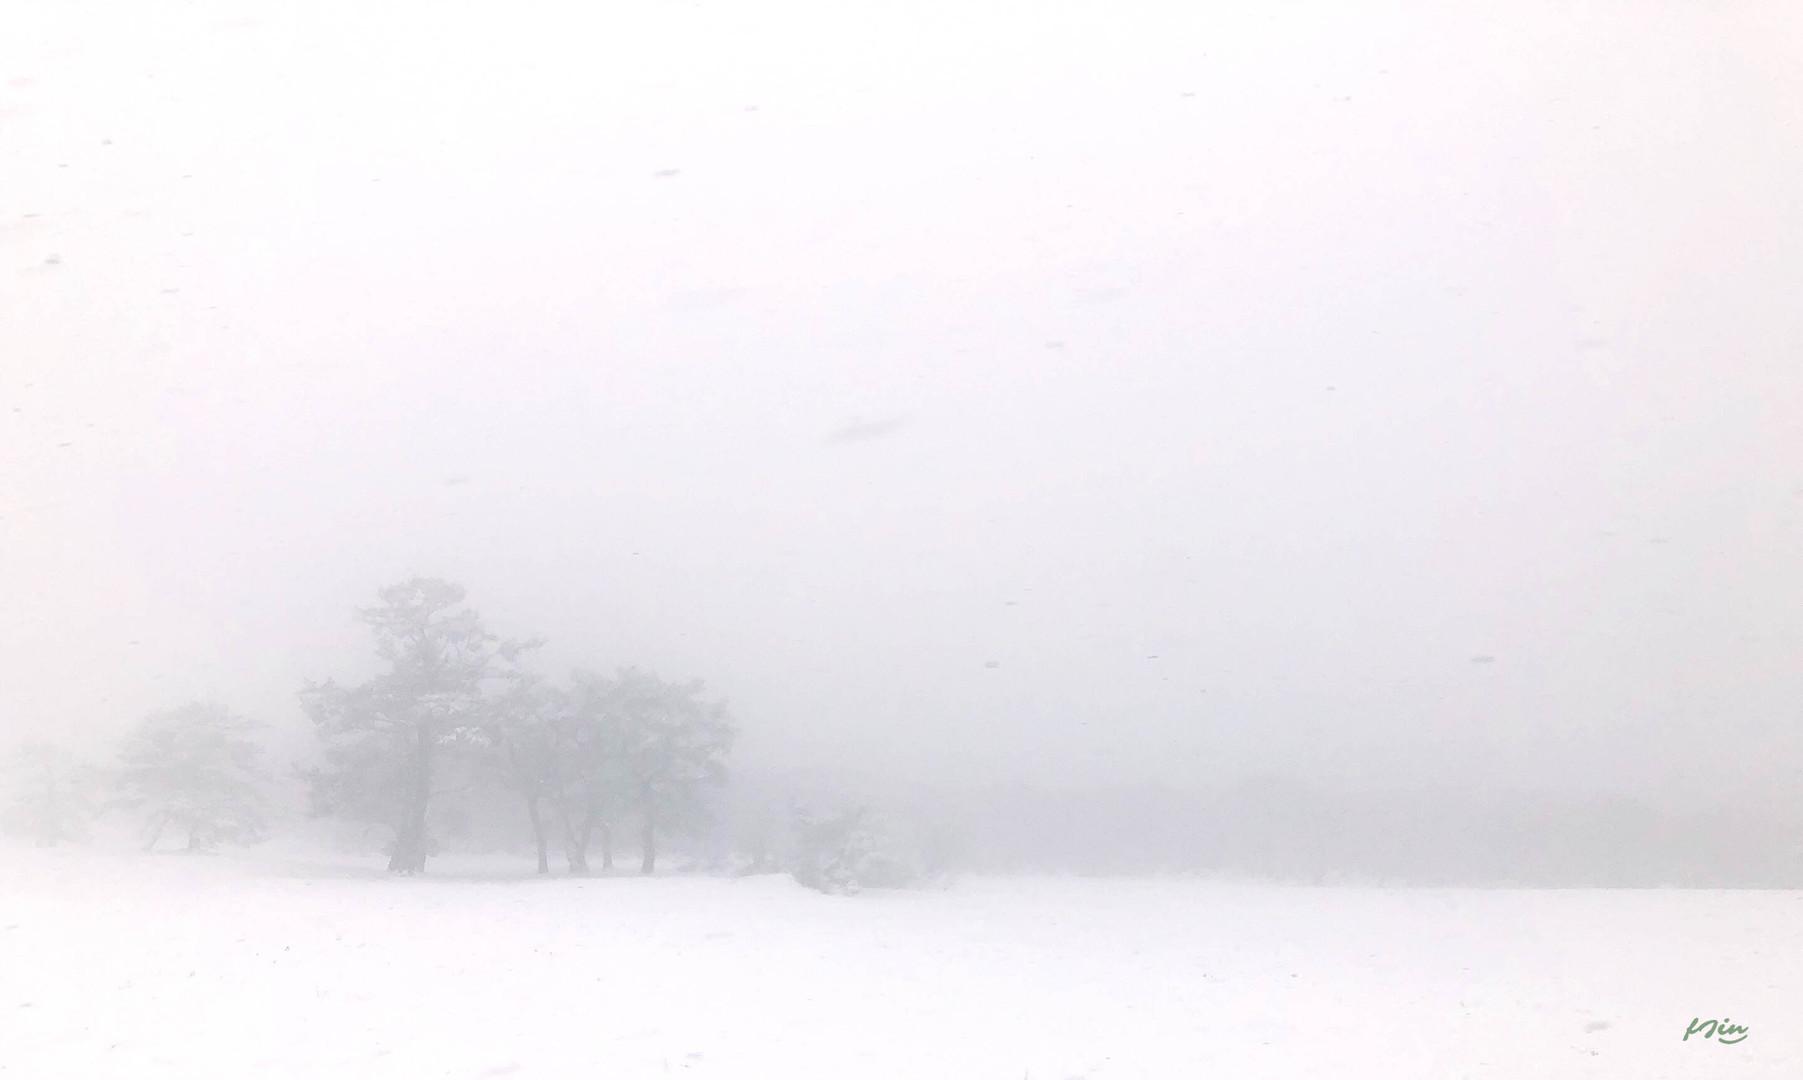 SnowyJeju1.jpg